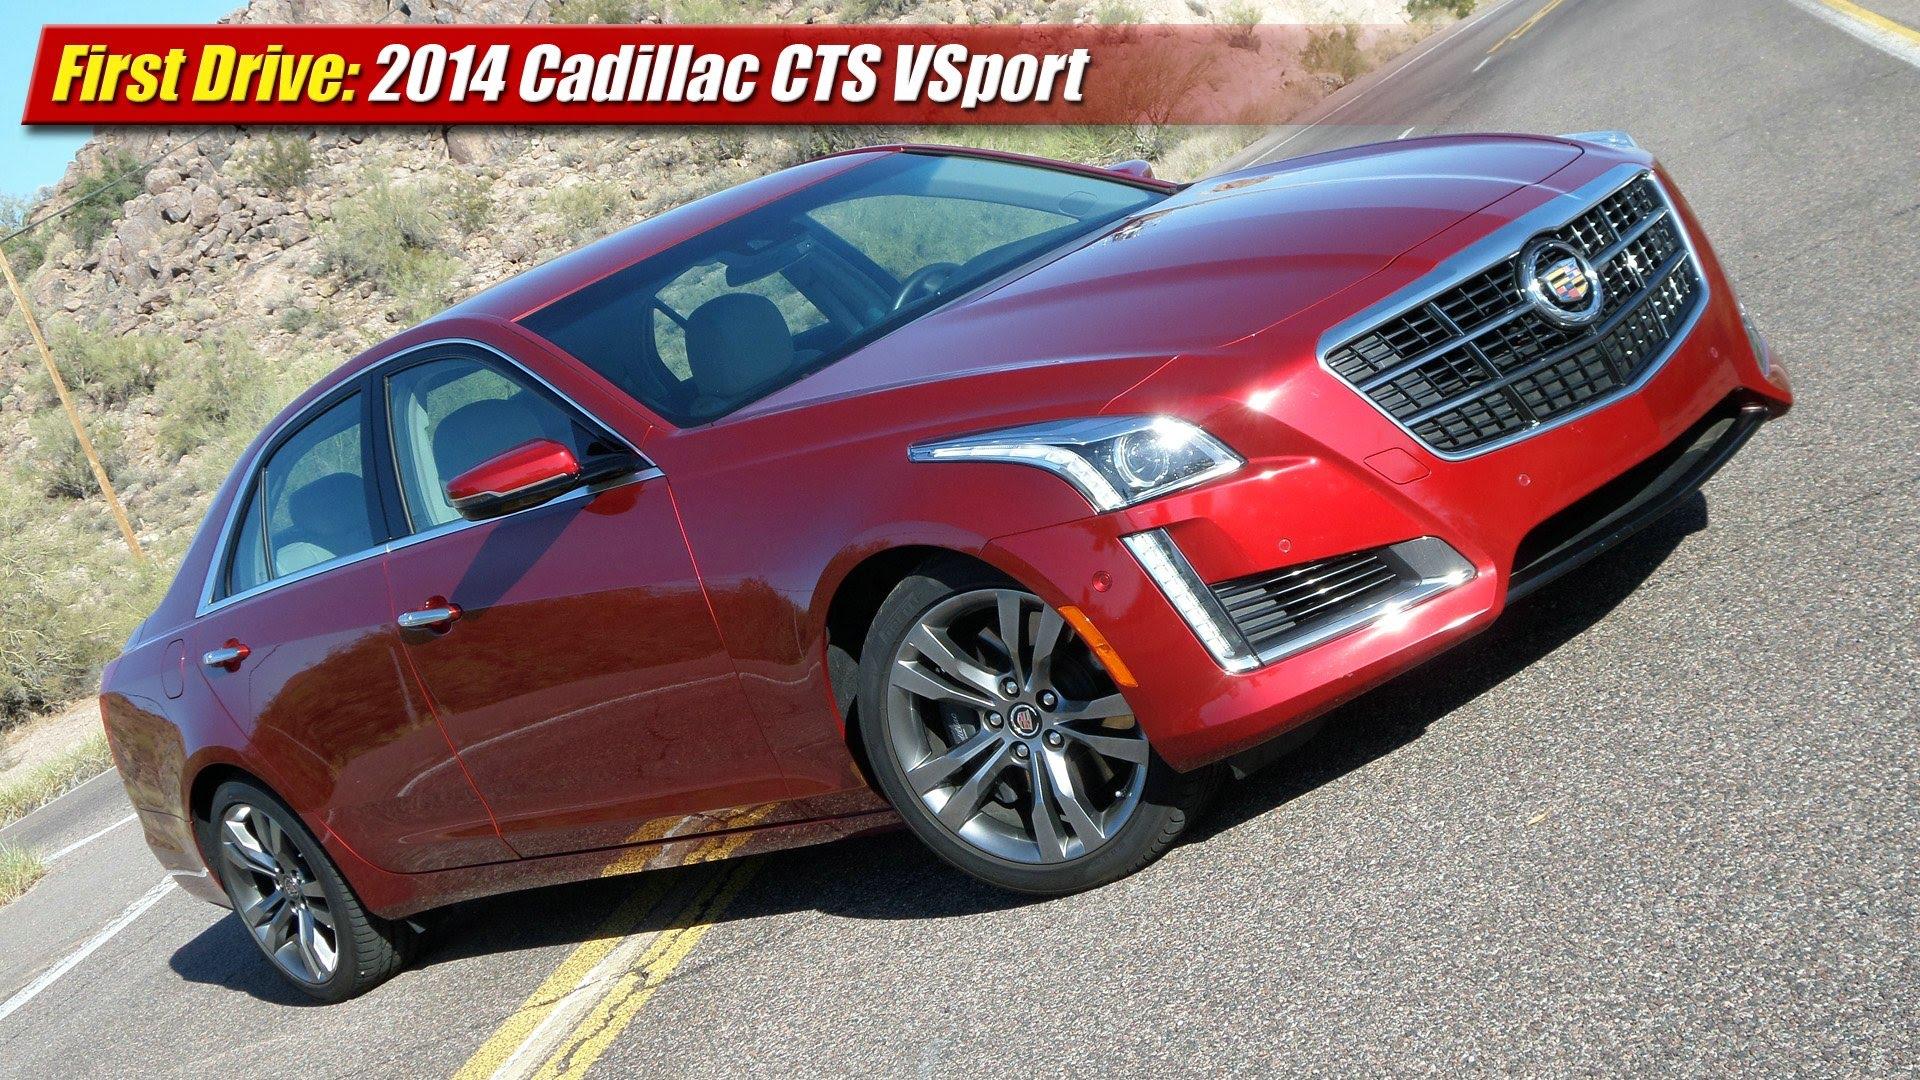 First Drive 2104 Cadillac Cts Vsport Testdriven Tv